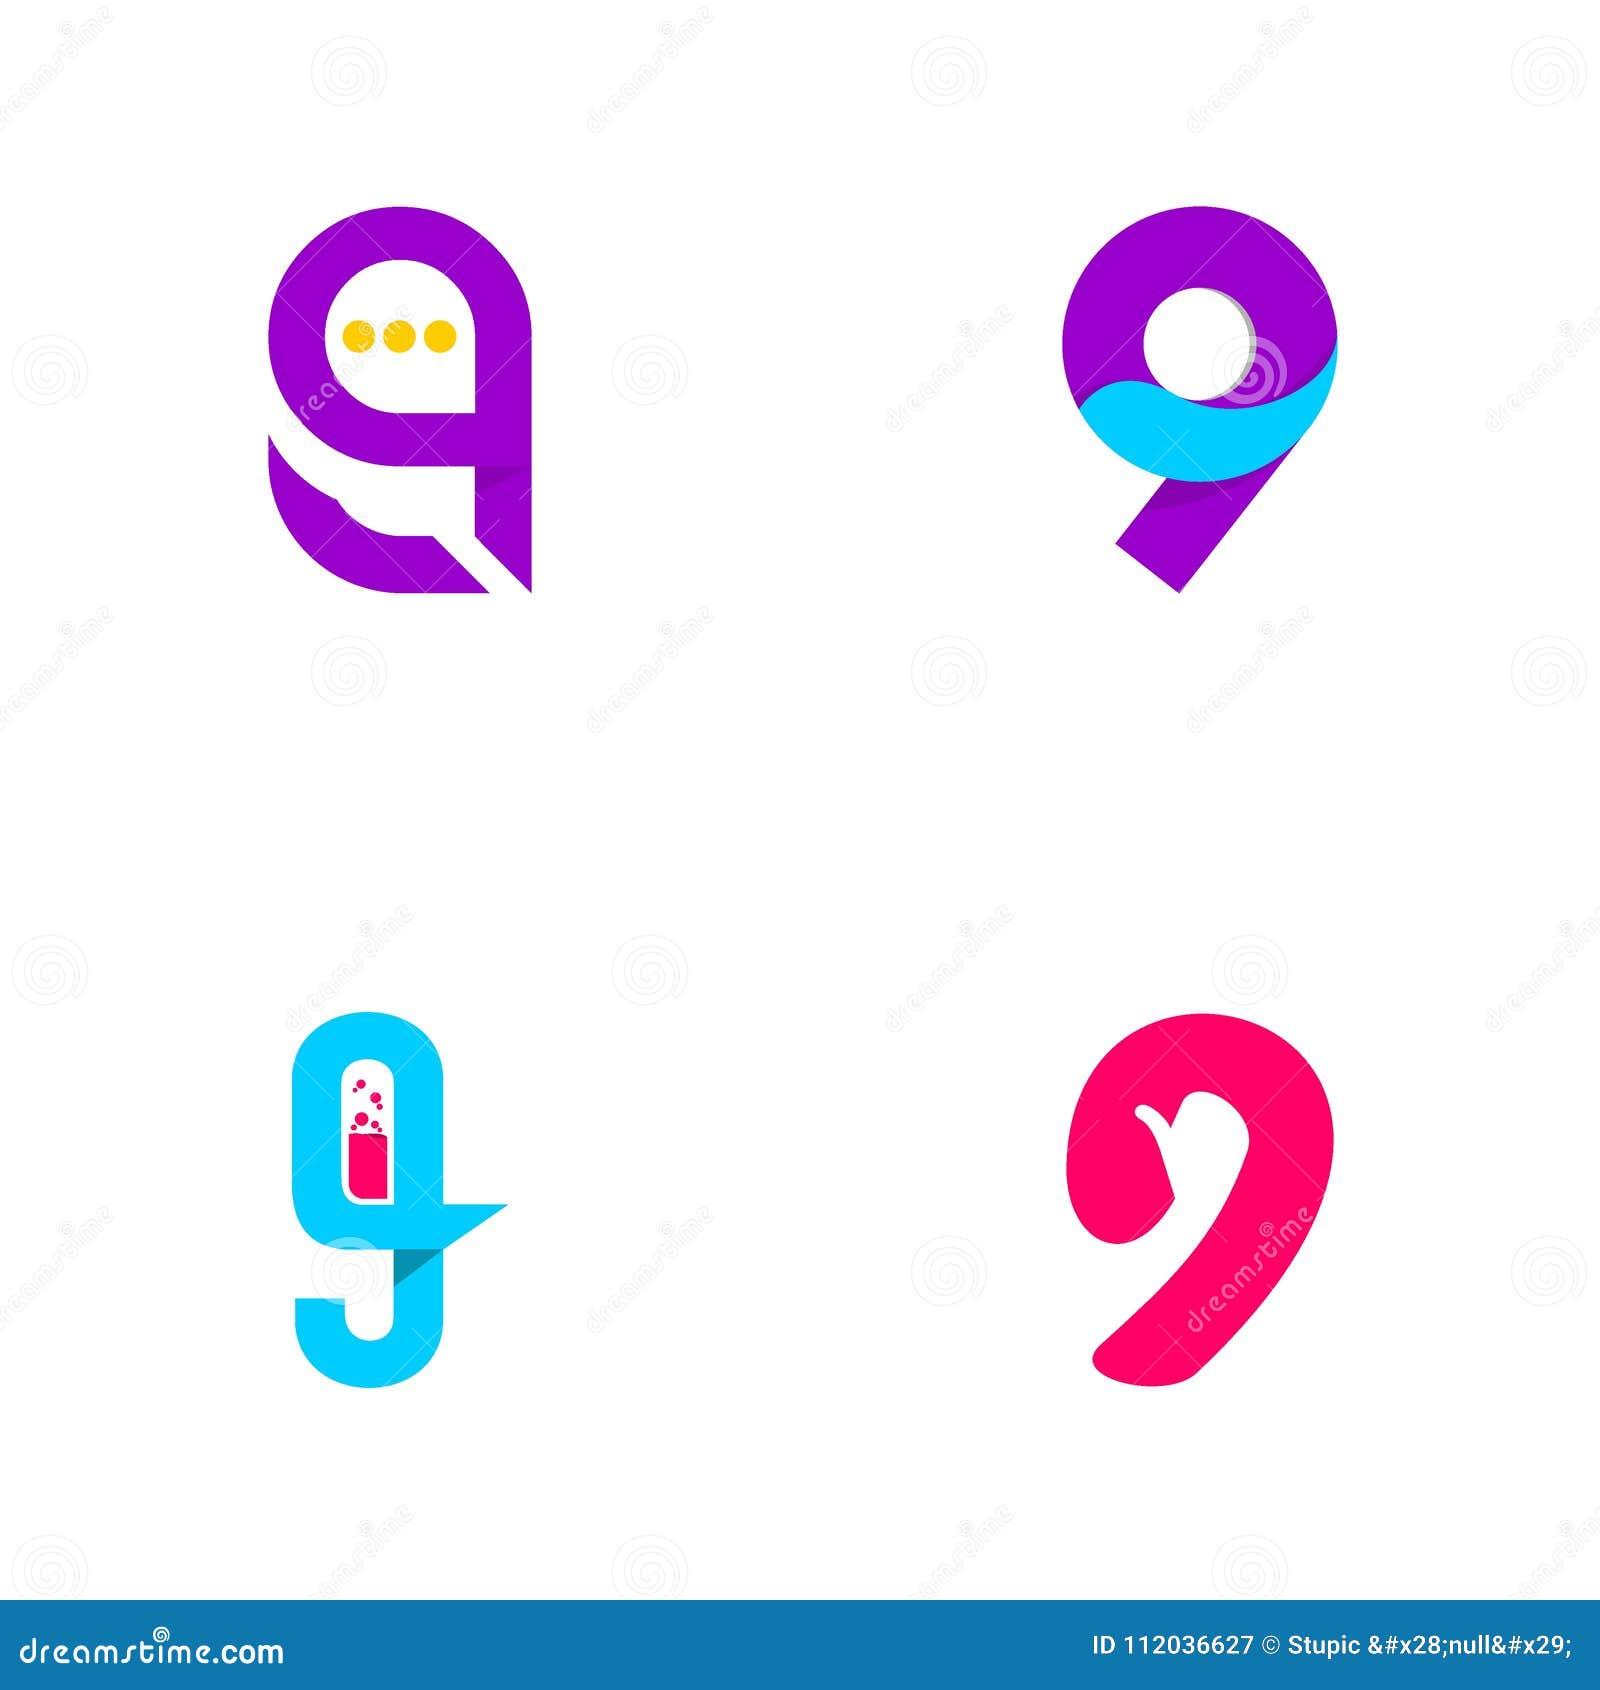 Creative 9 Logo Design Vector Art Logo Stock Vector - Illustration of  celebration, emblem: 112036627